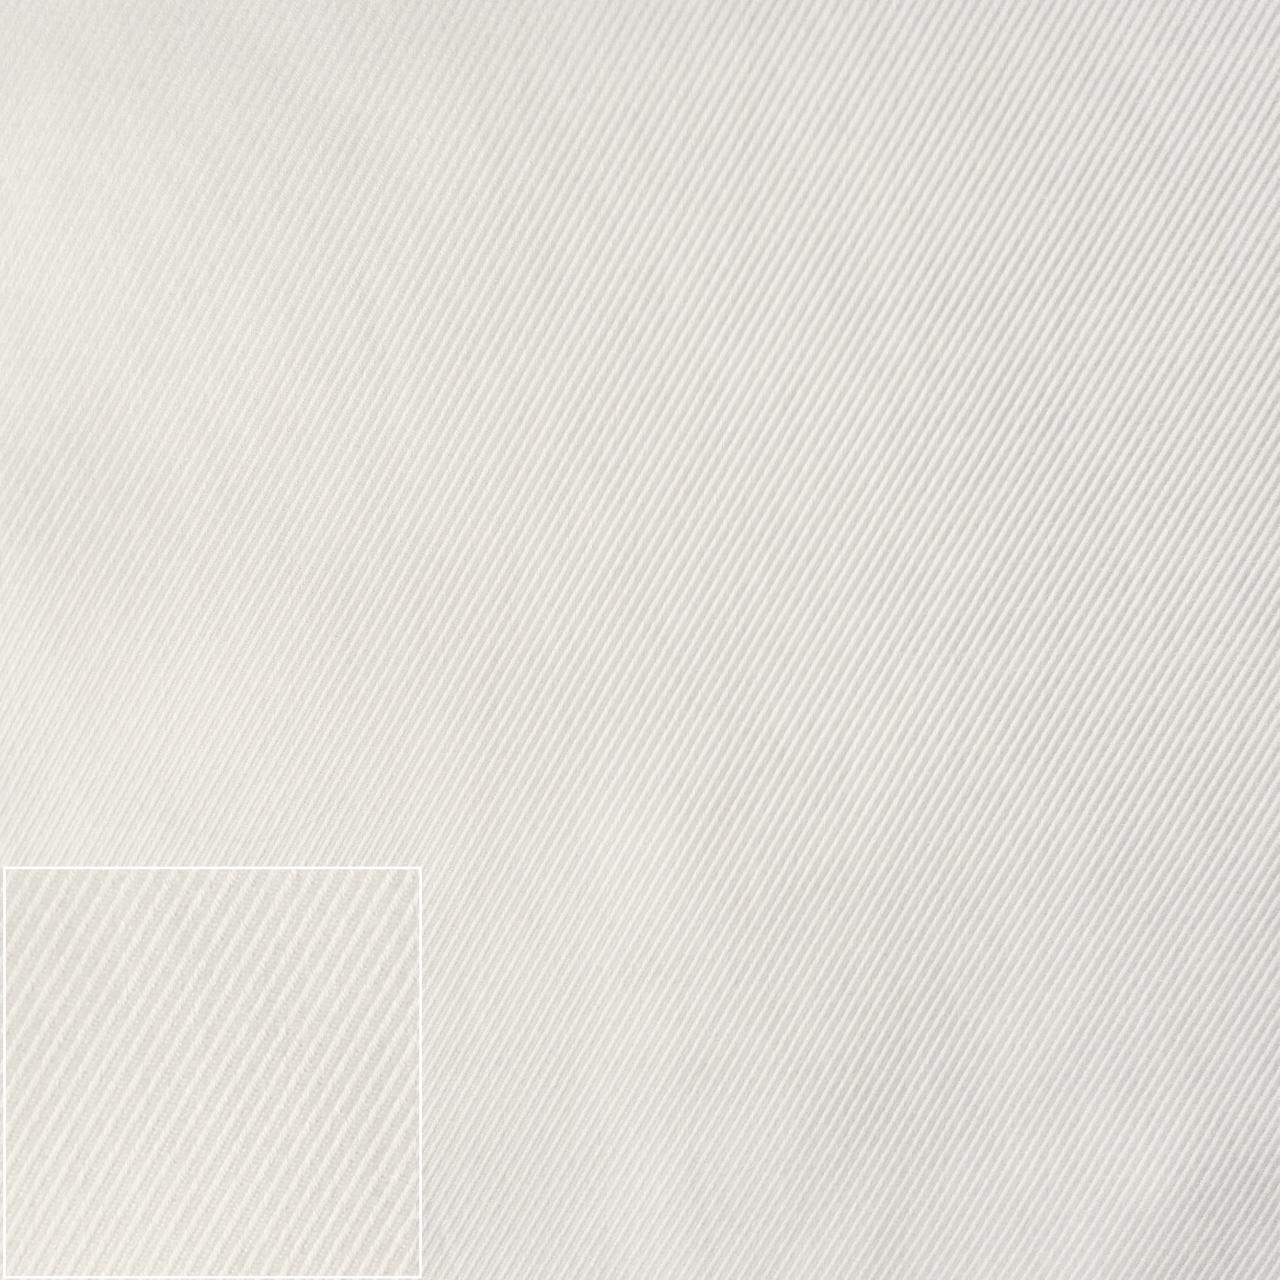 Bílá diagonála T46, 100/2, Twill